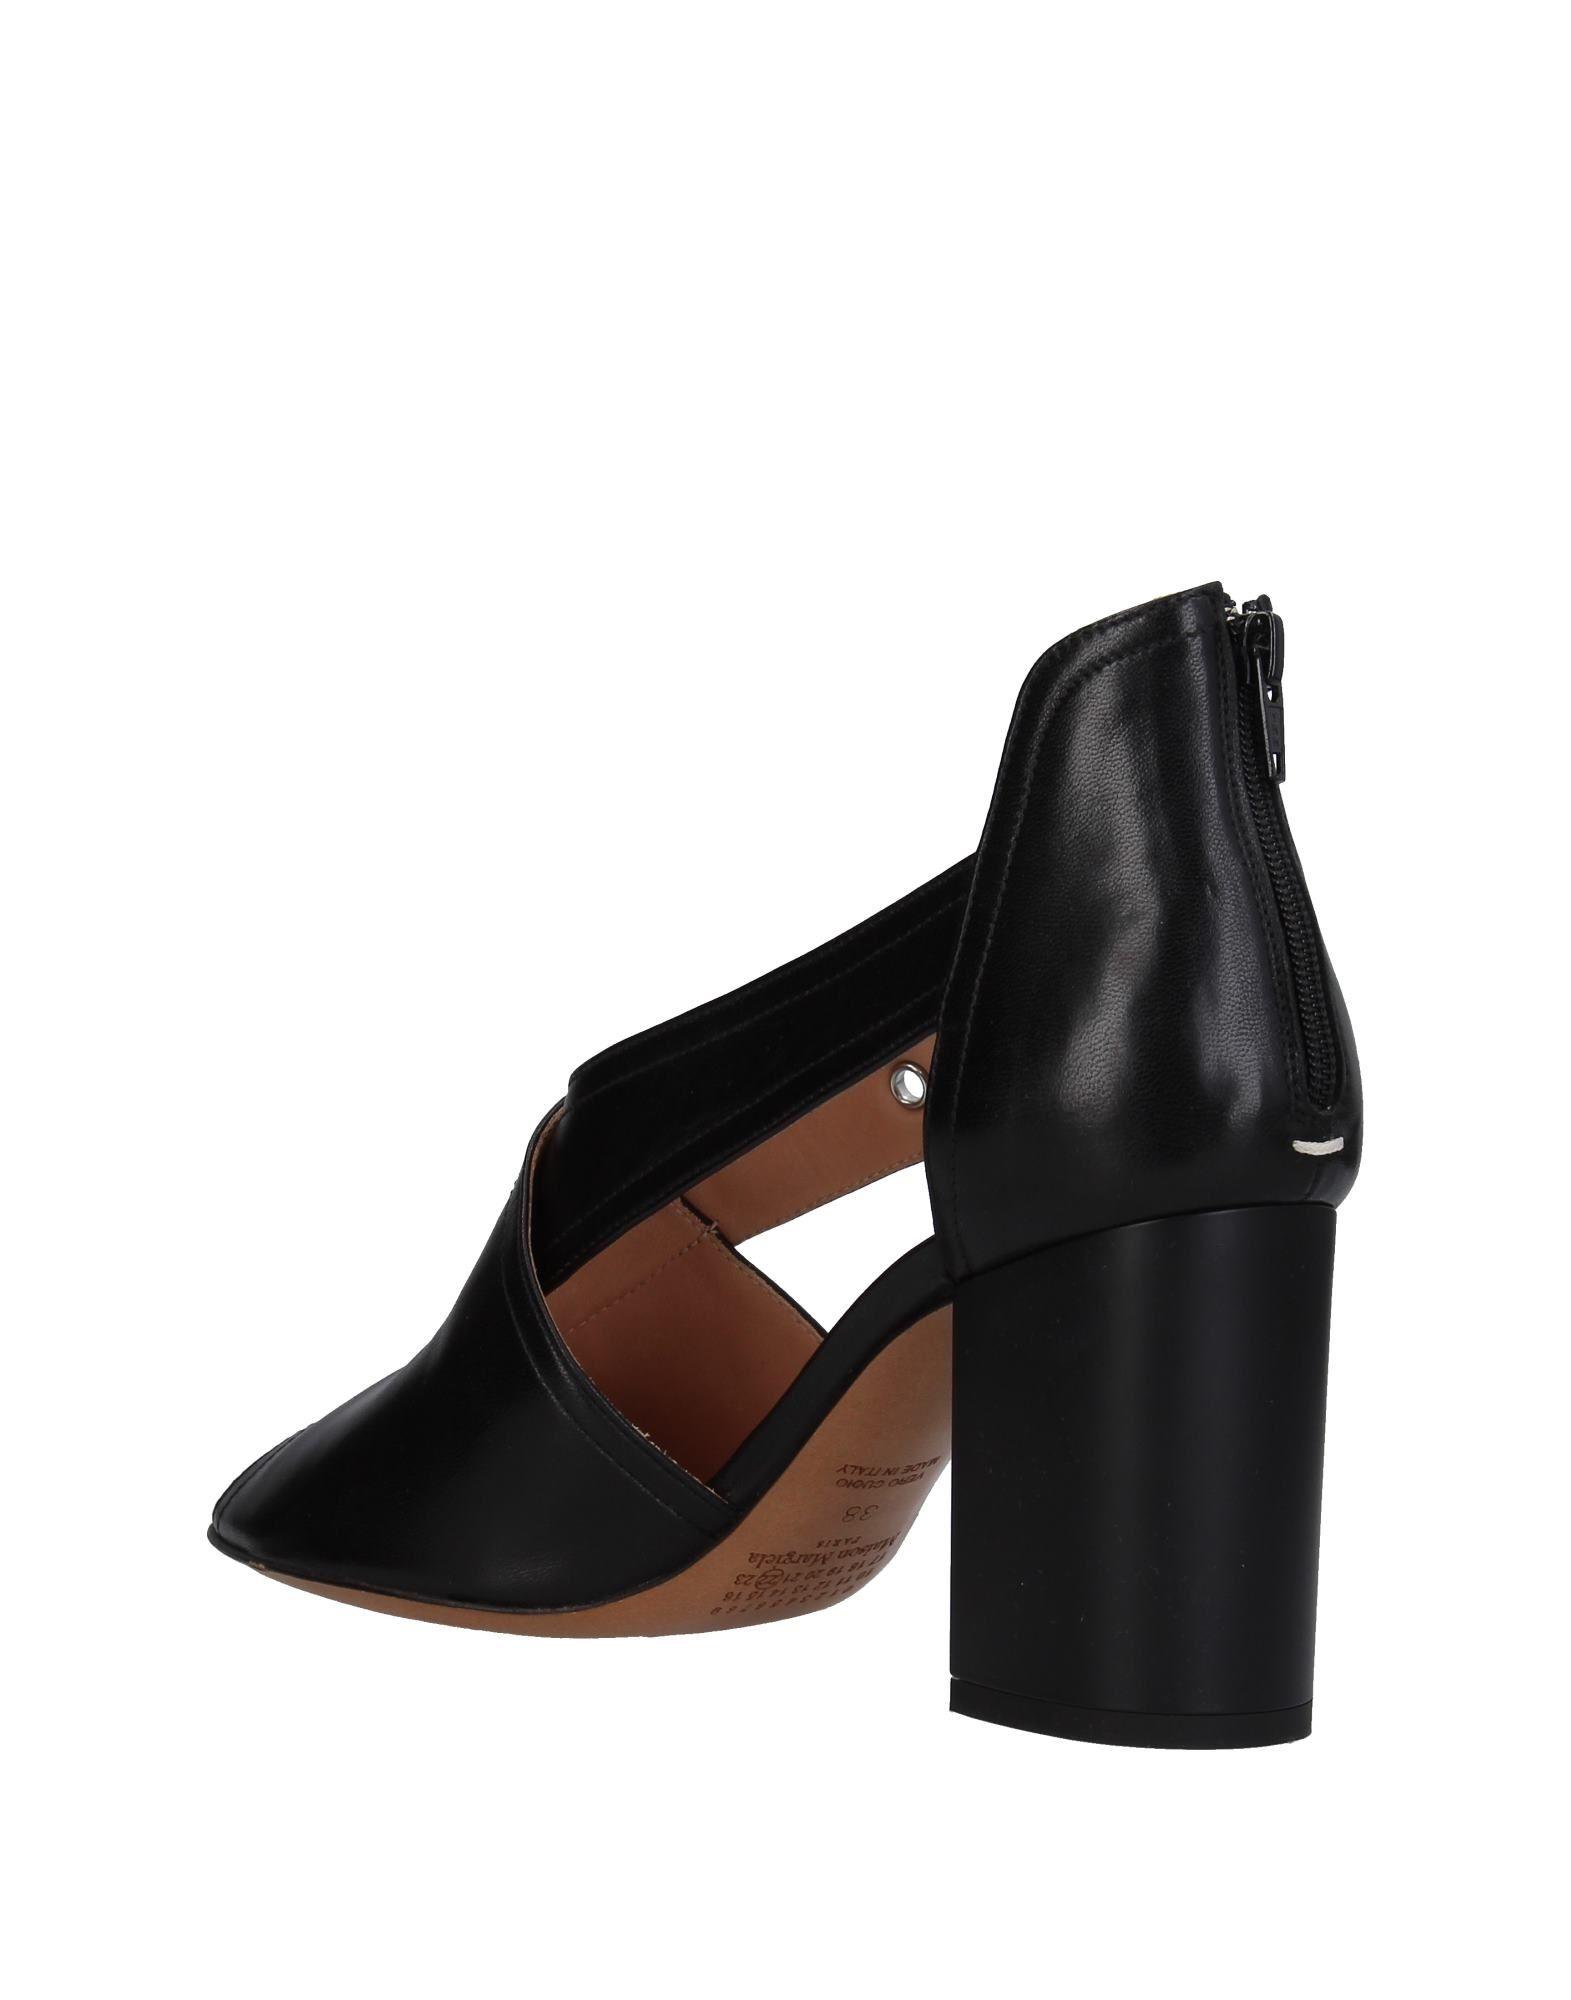 Maison Margiela Sandalen Sandalen Sandalen Damen  11378383SB Beliebte Schuhe 1f4c66